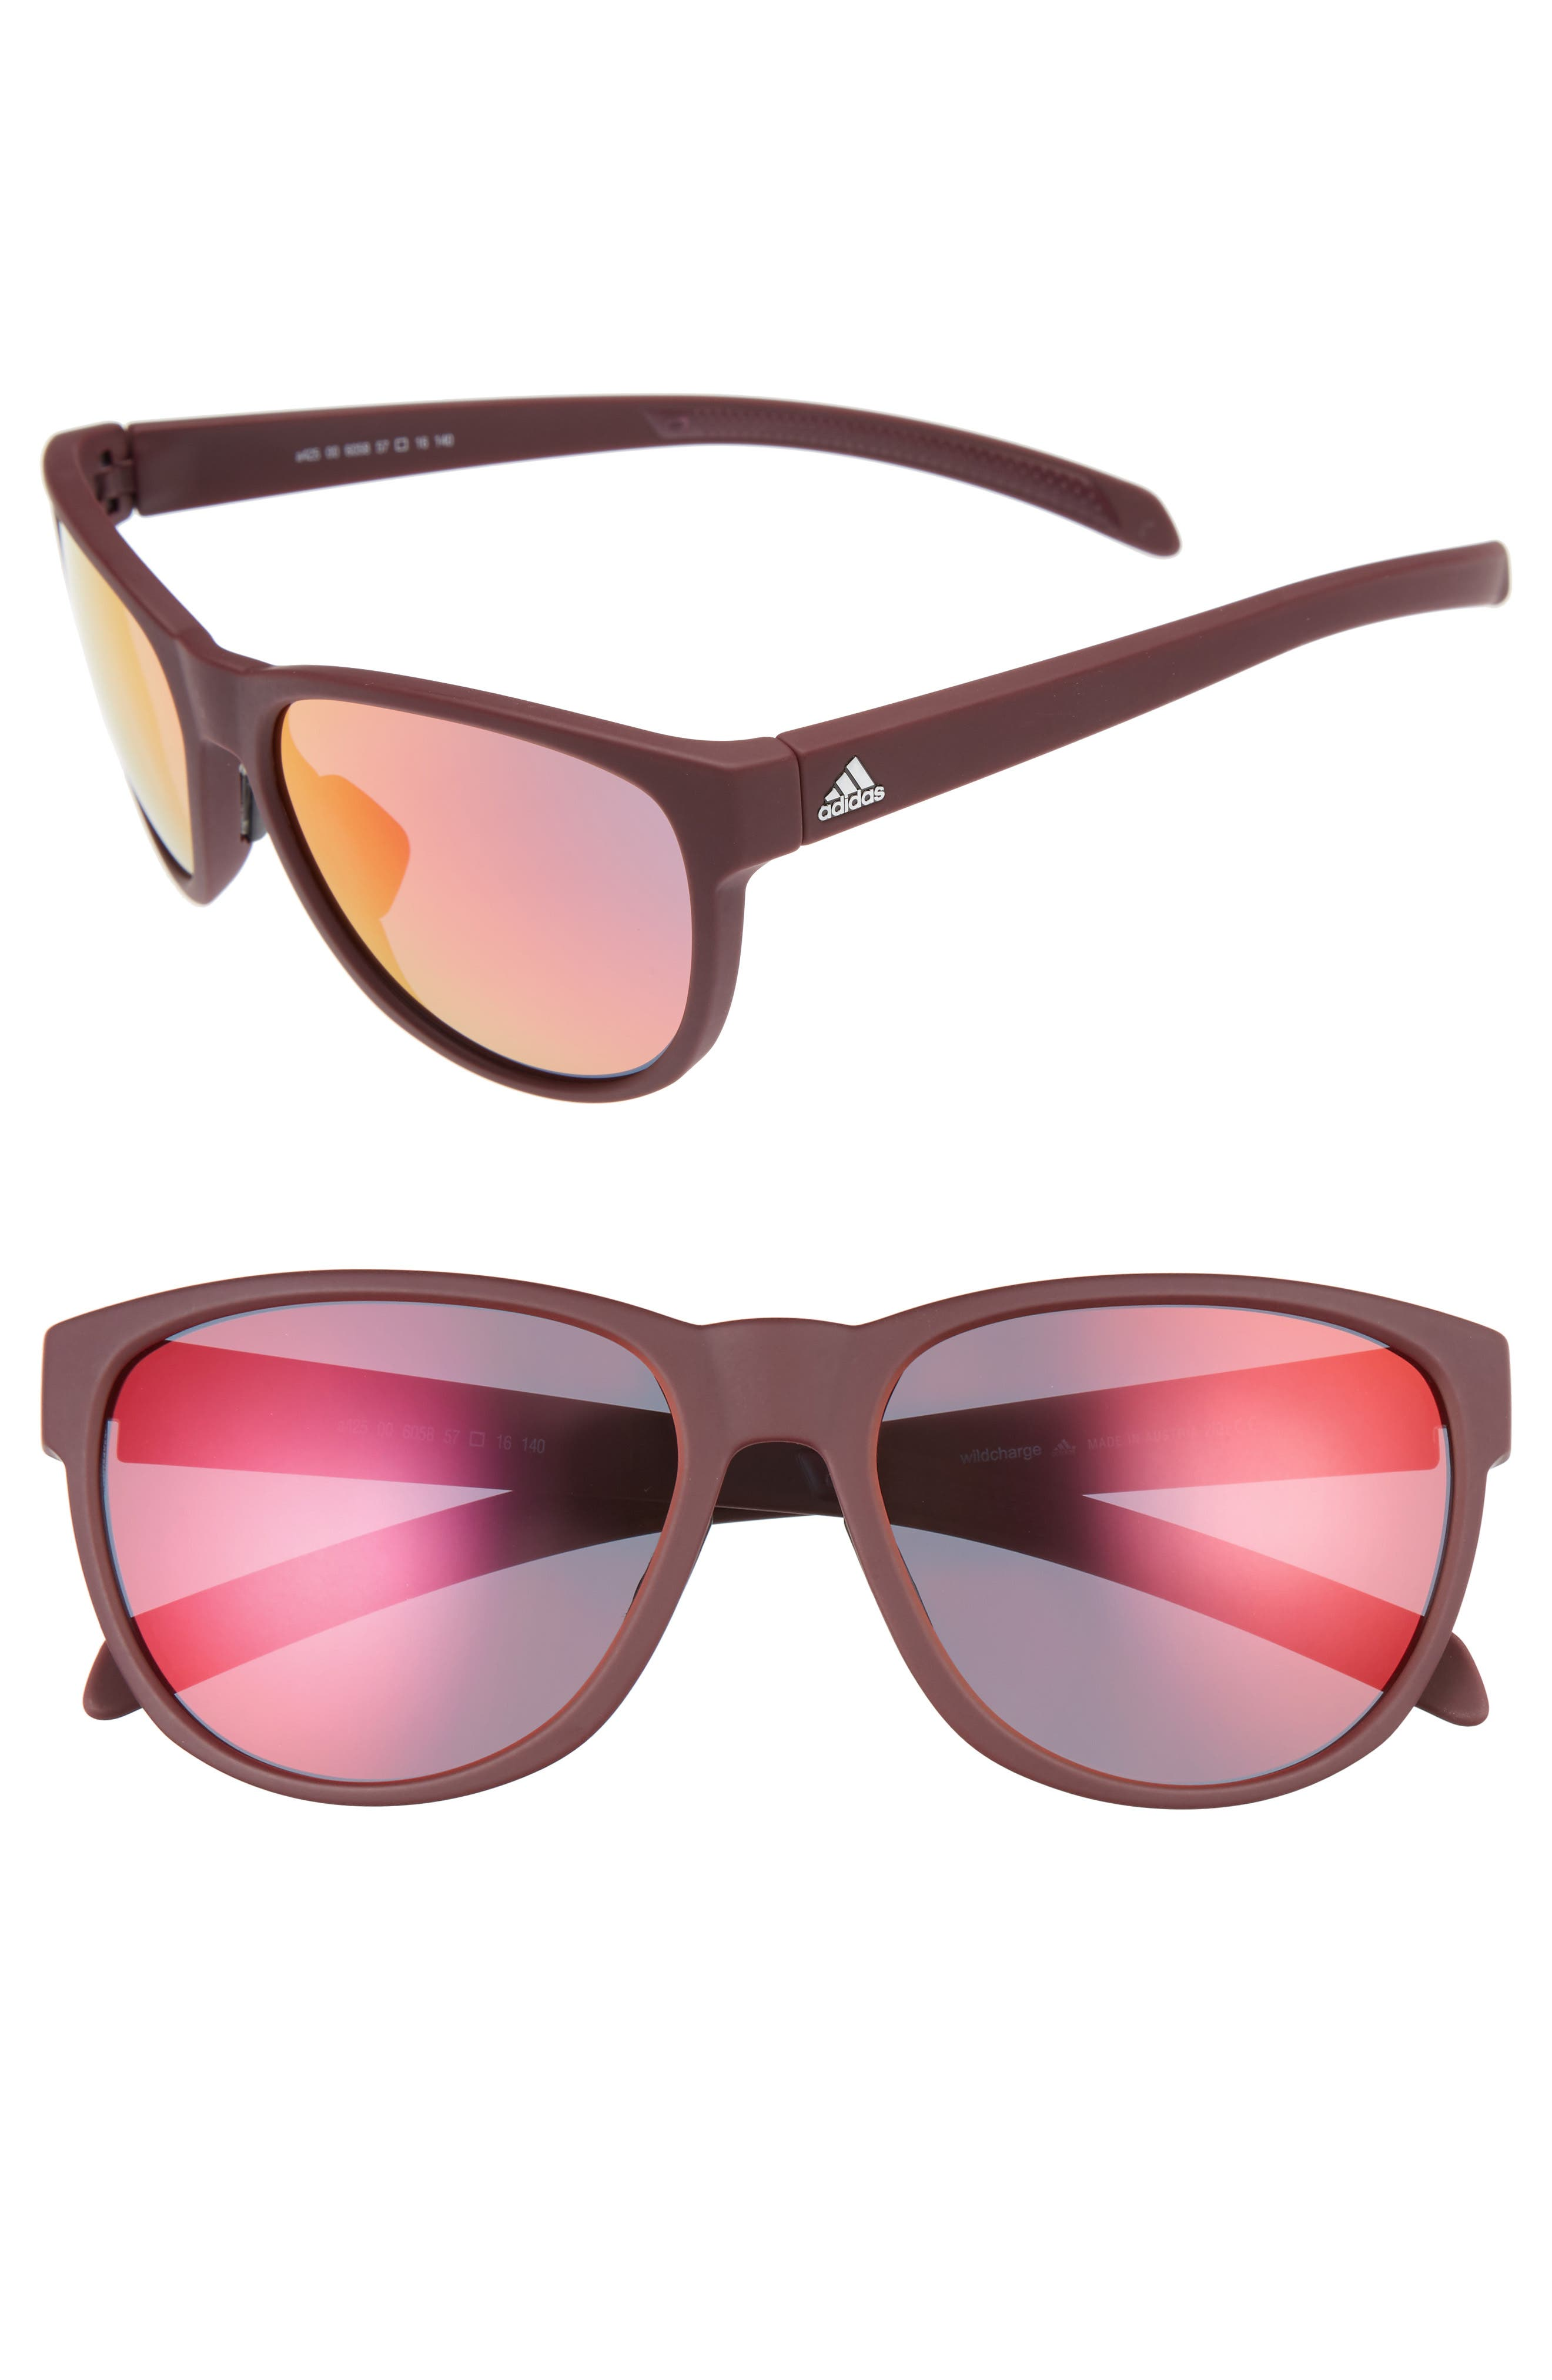 adidas Wildcharge 61mm Mirrored Sunglasses